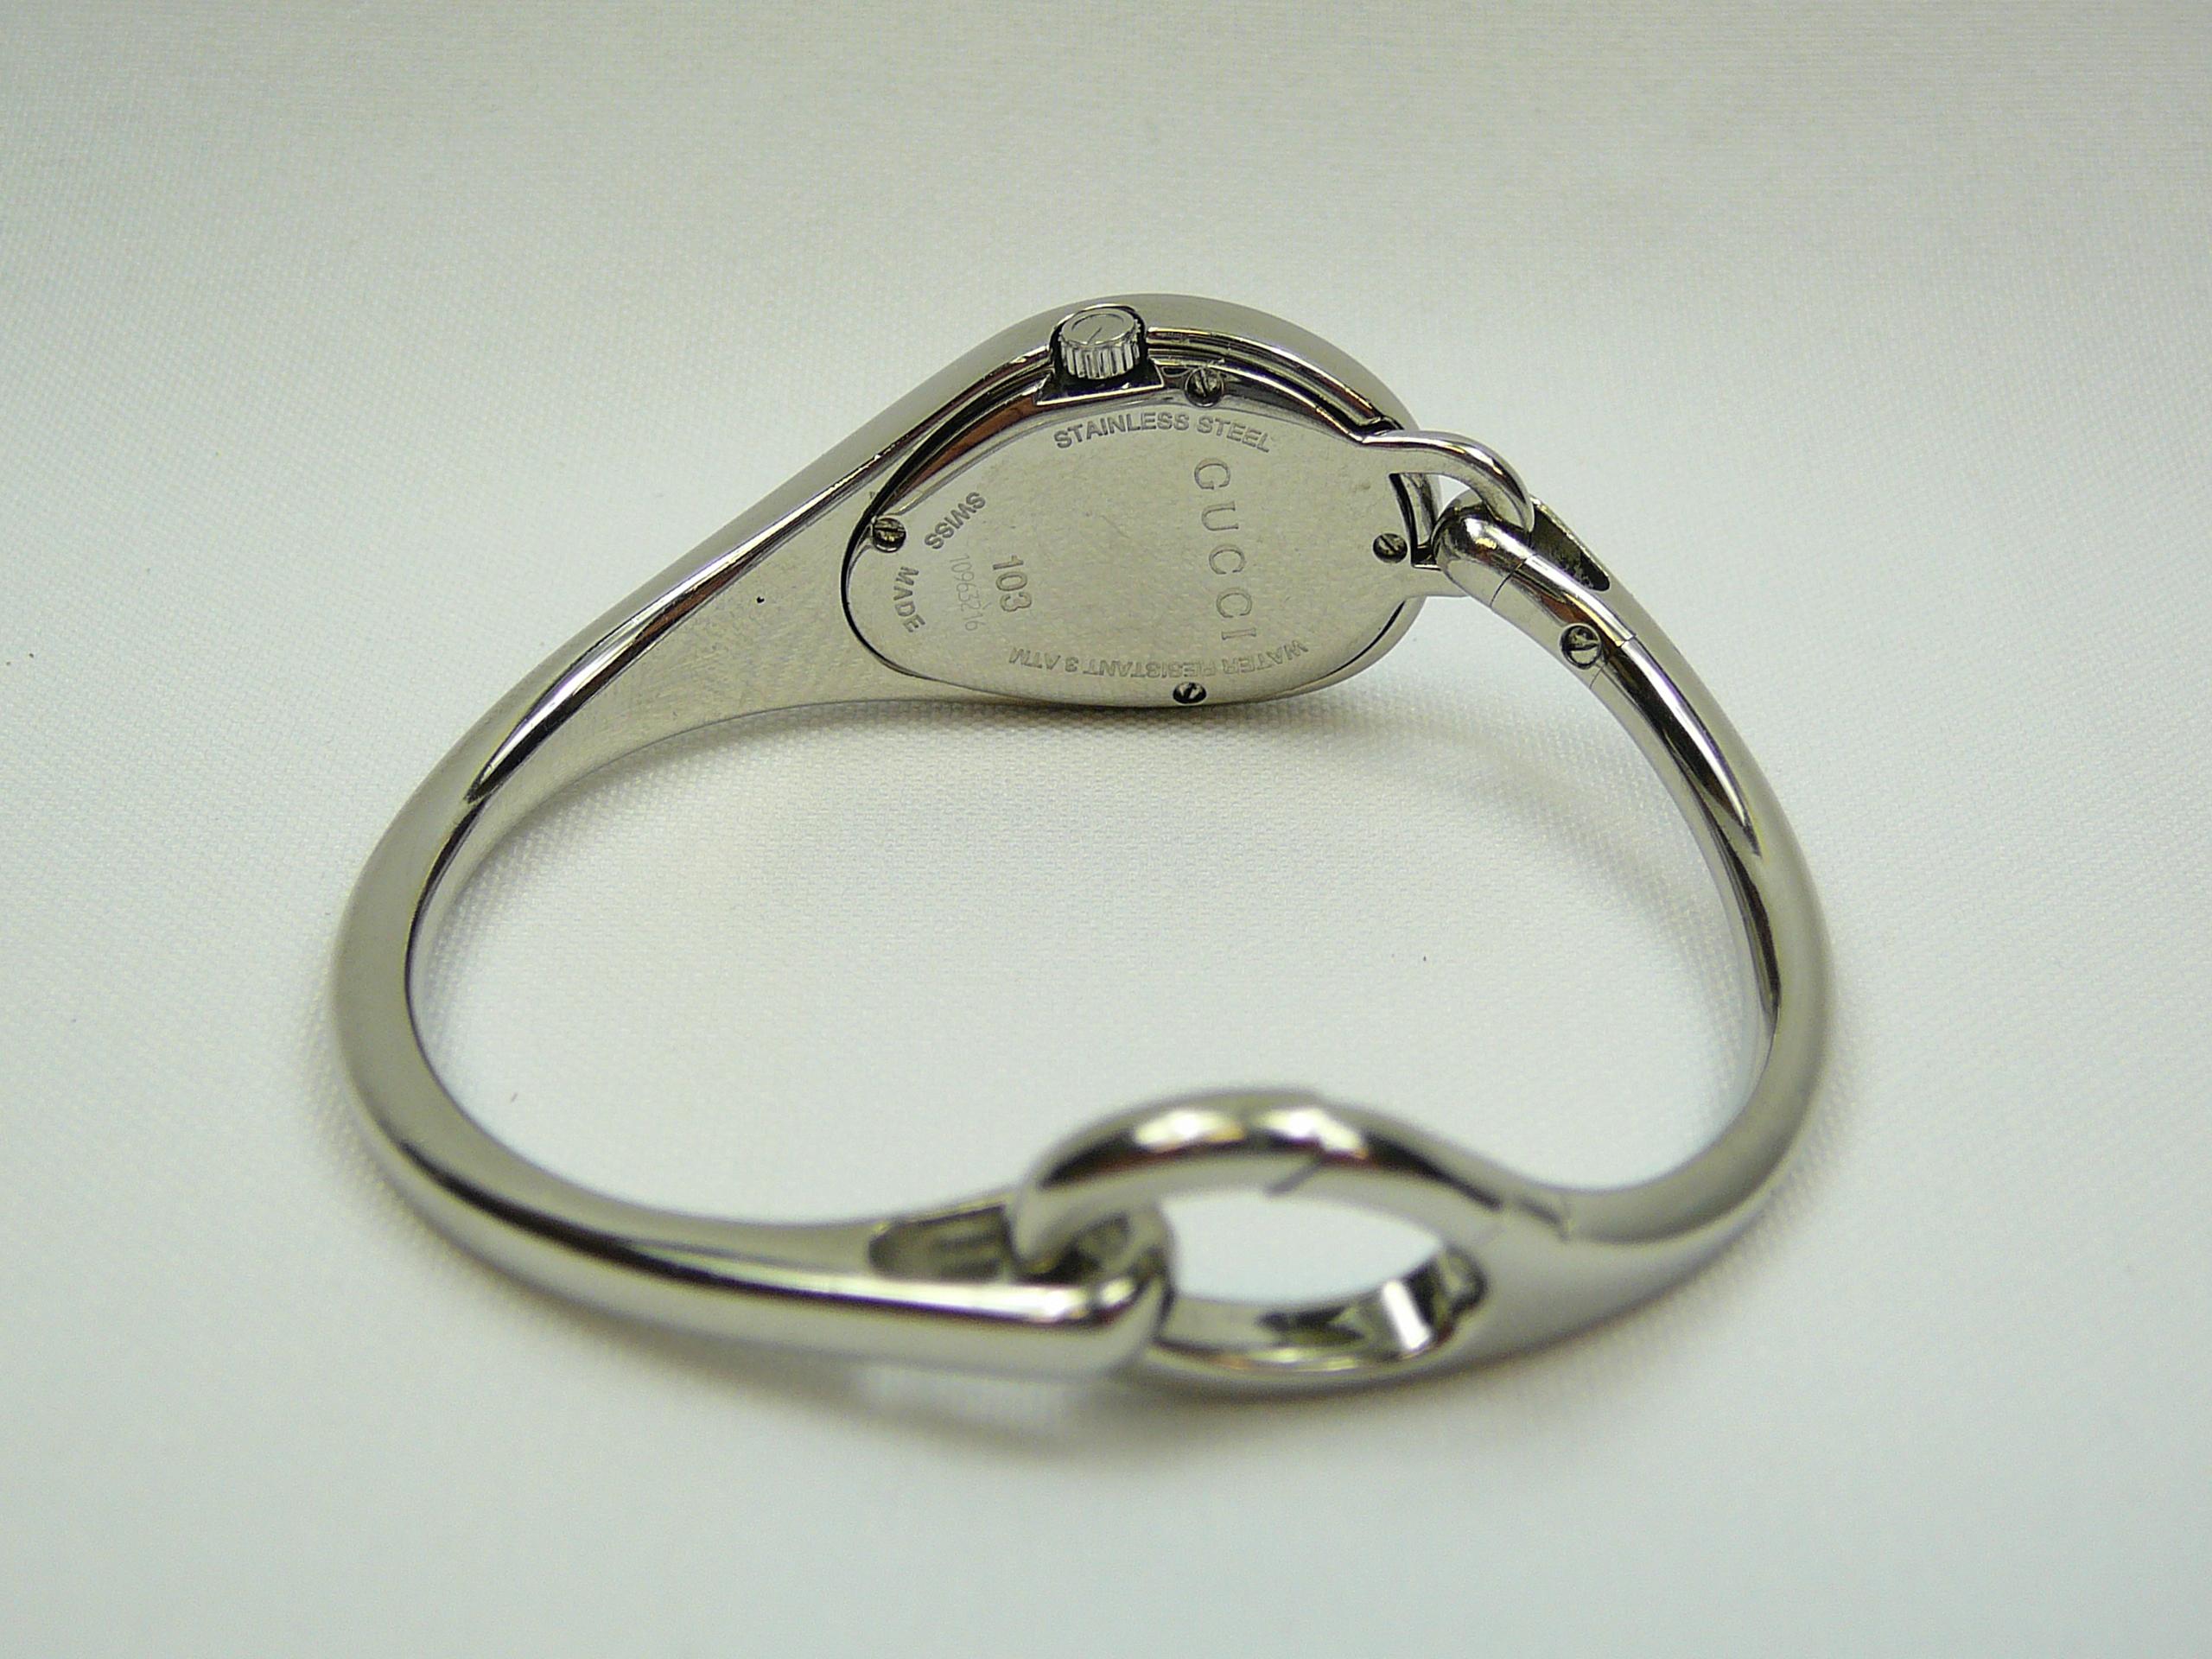 Ladies Gucci Bangle Wrist Watch - Image 3 of 3